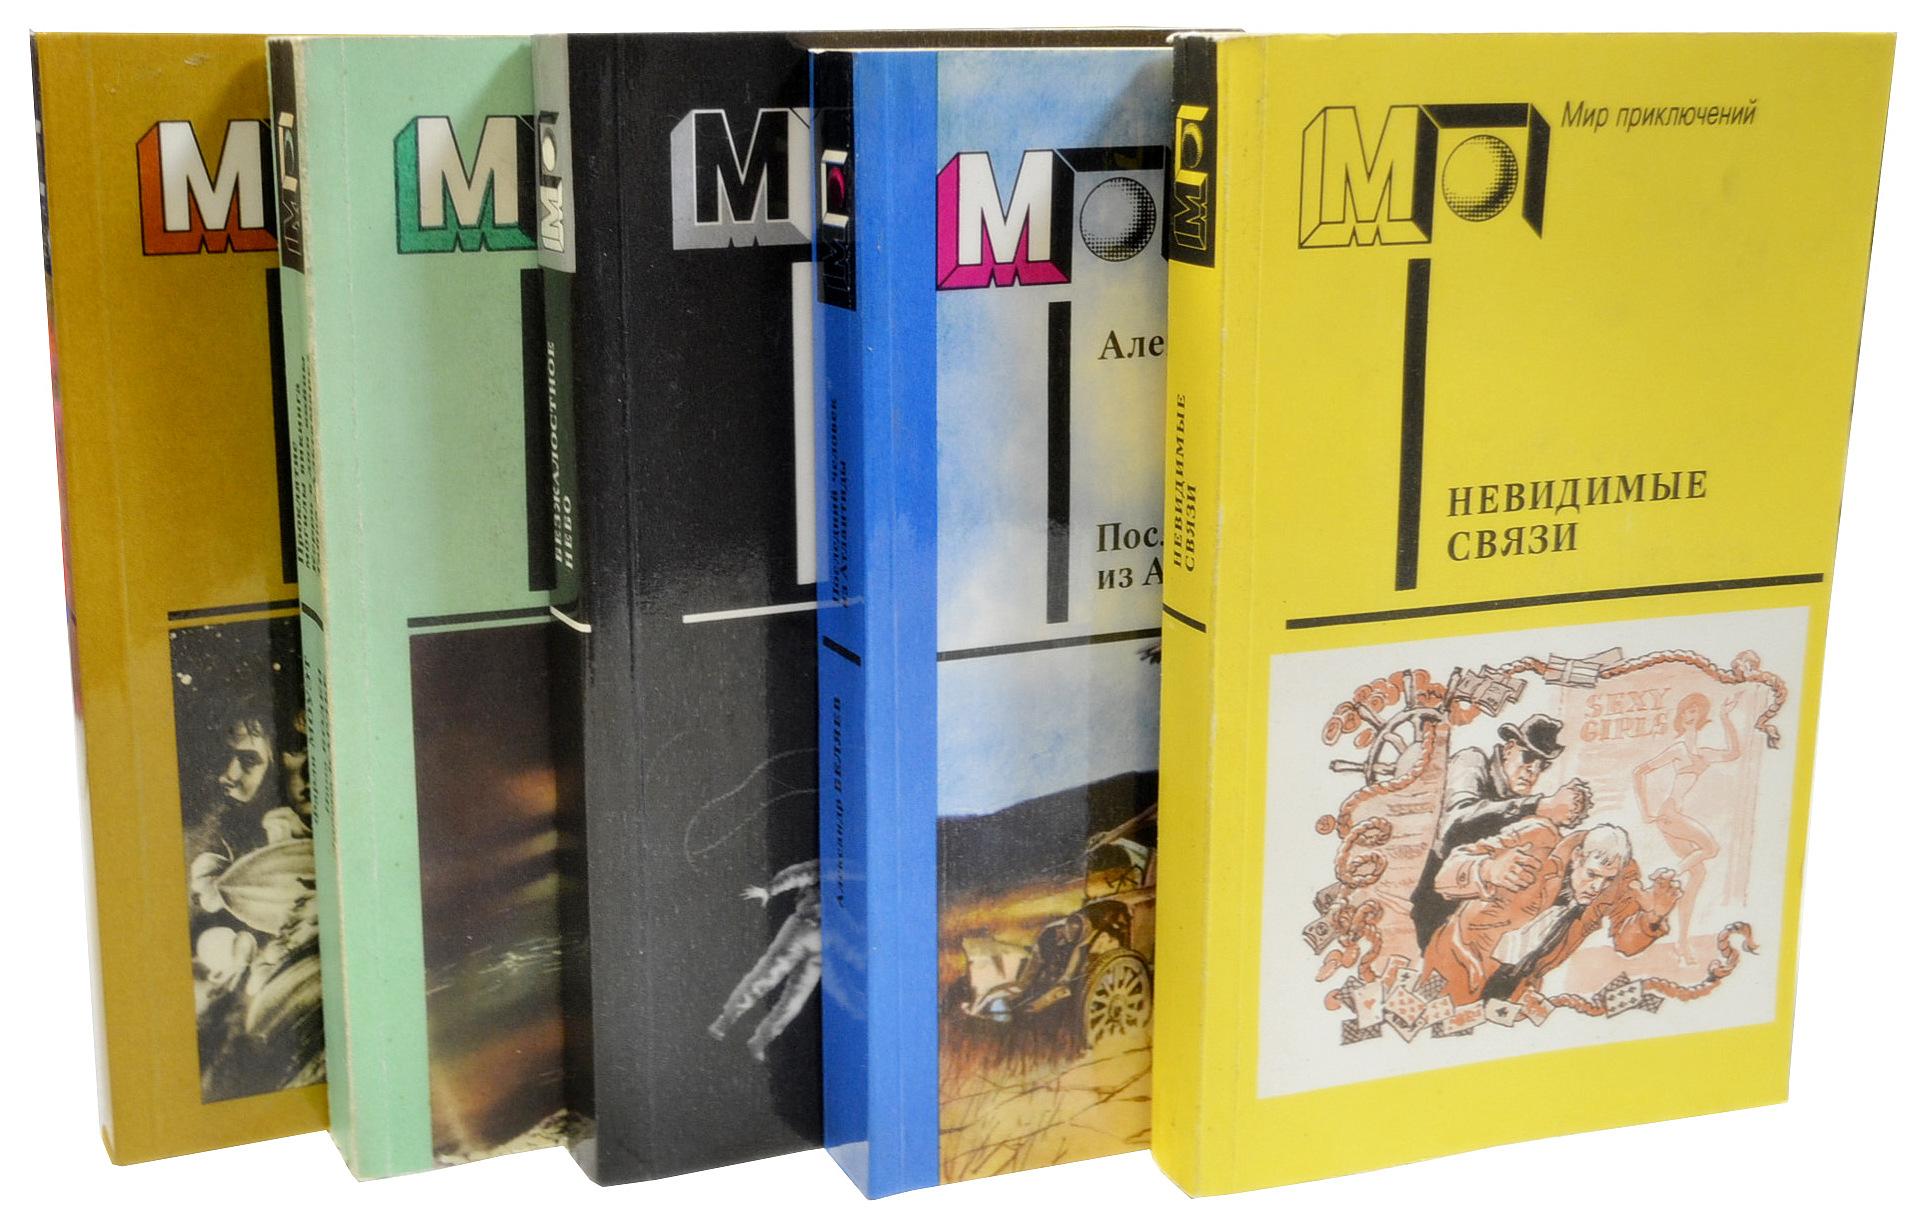 Серия Мир приключений (комплект из 5 книг) серия мир приключений комплект из 5 книг